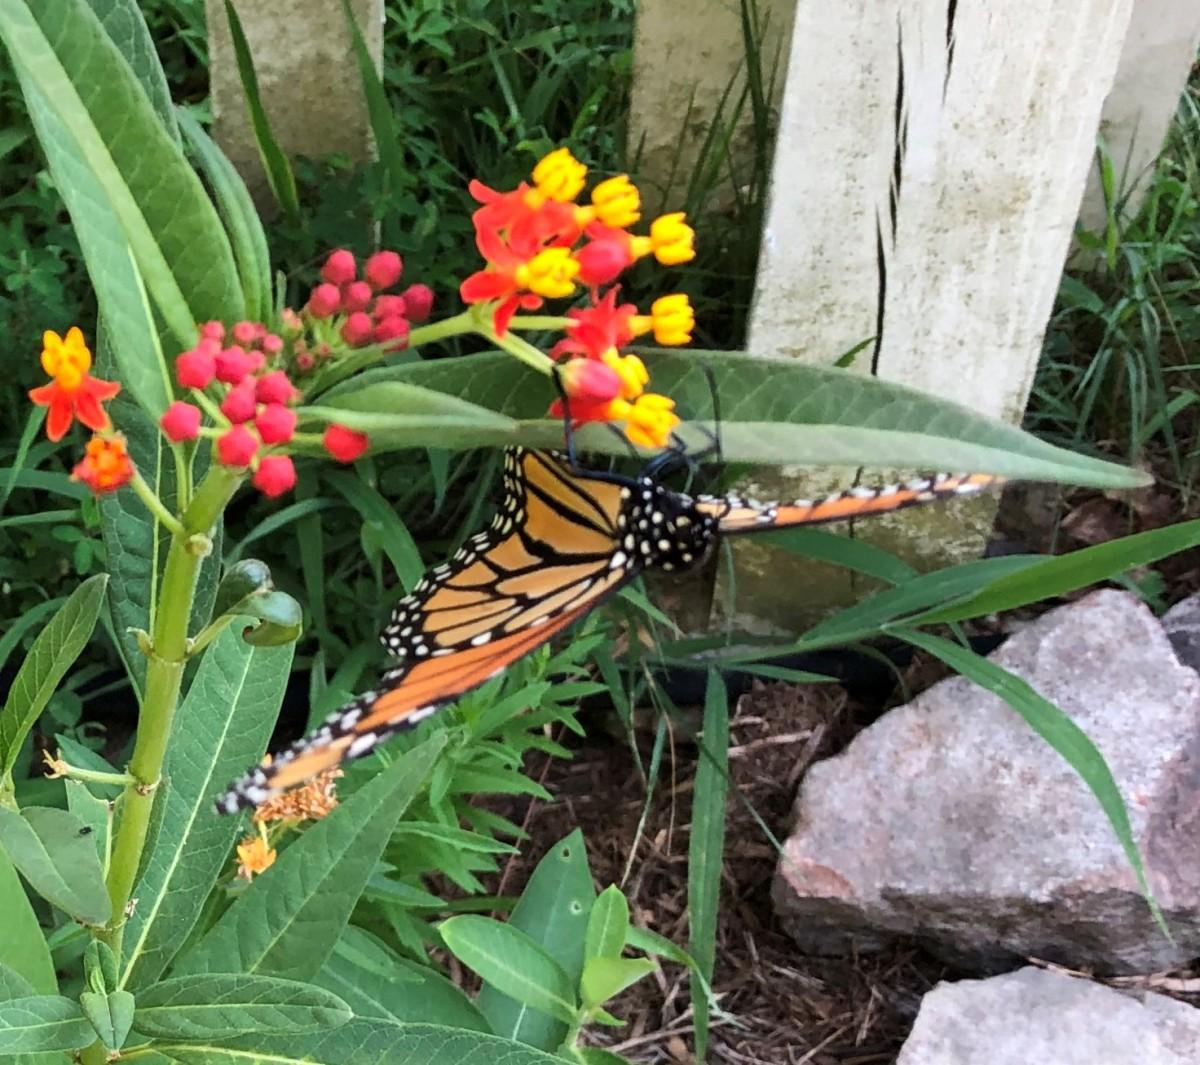 Monarch females usually deposit  eggs on the undersides of milkweed leaves.